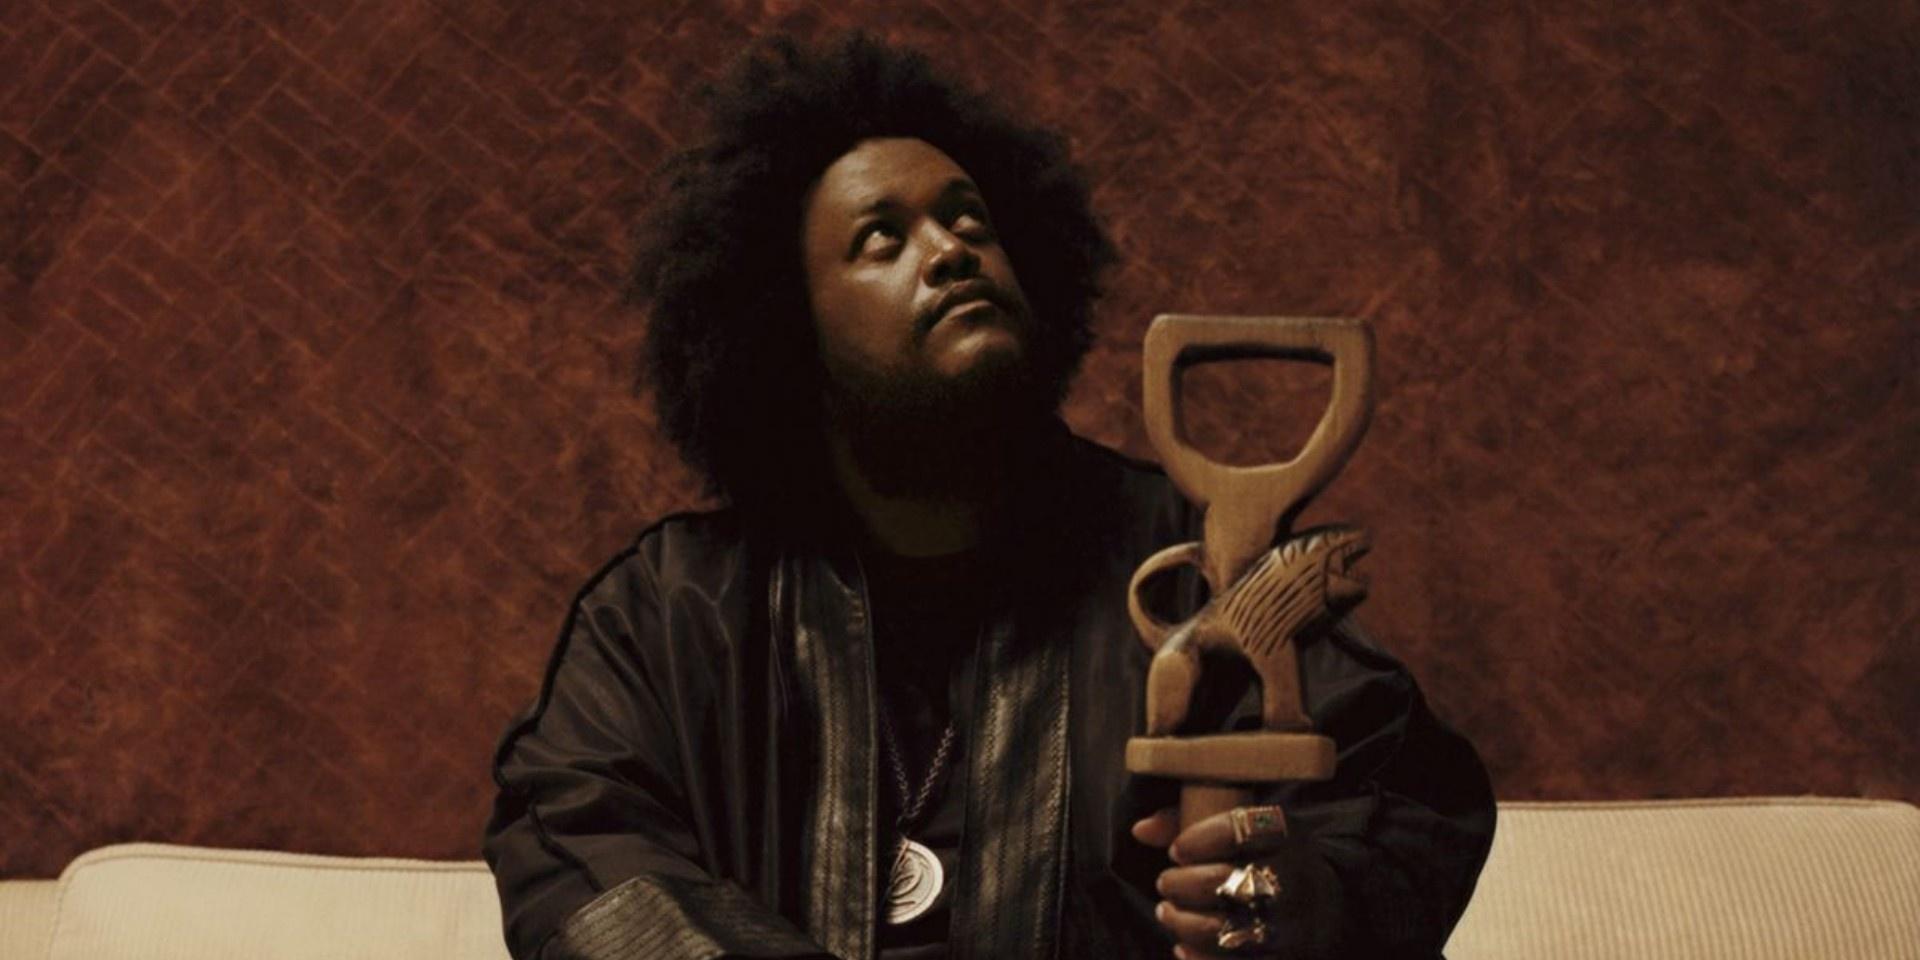 Kamasi Washington shares riveting music video for 'Hub-Tones'